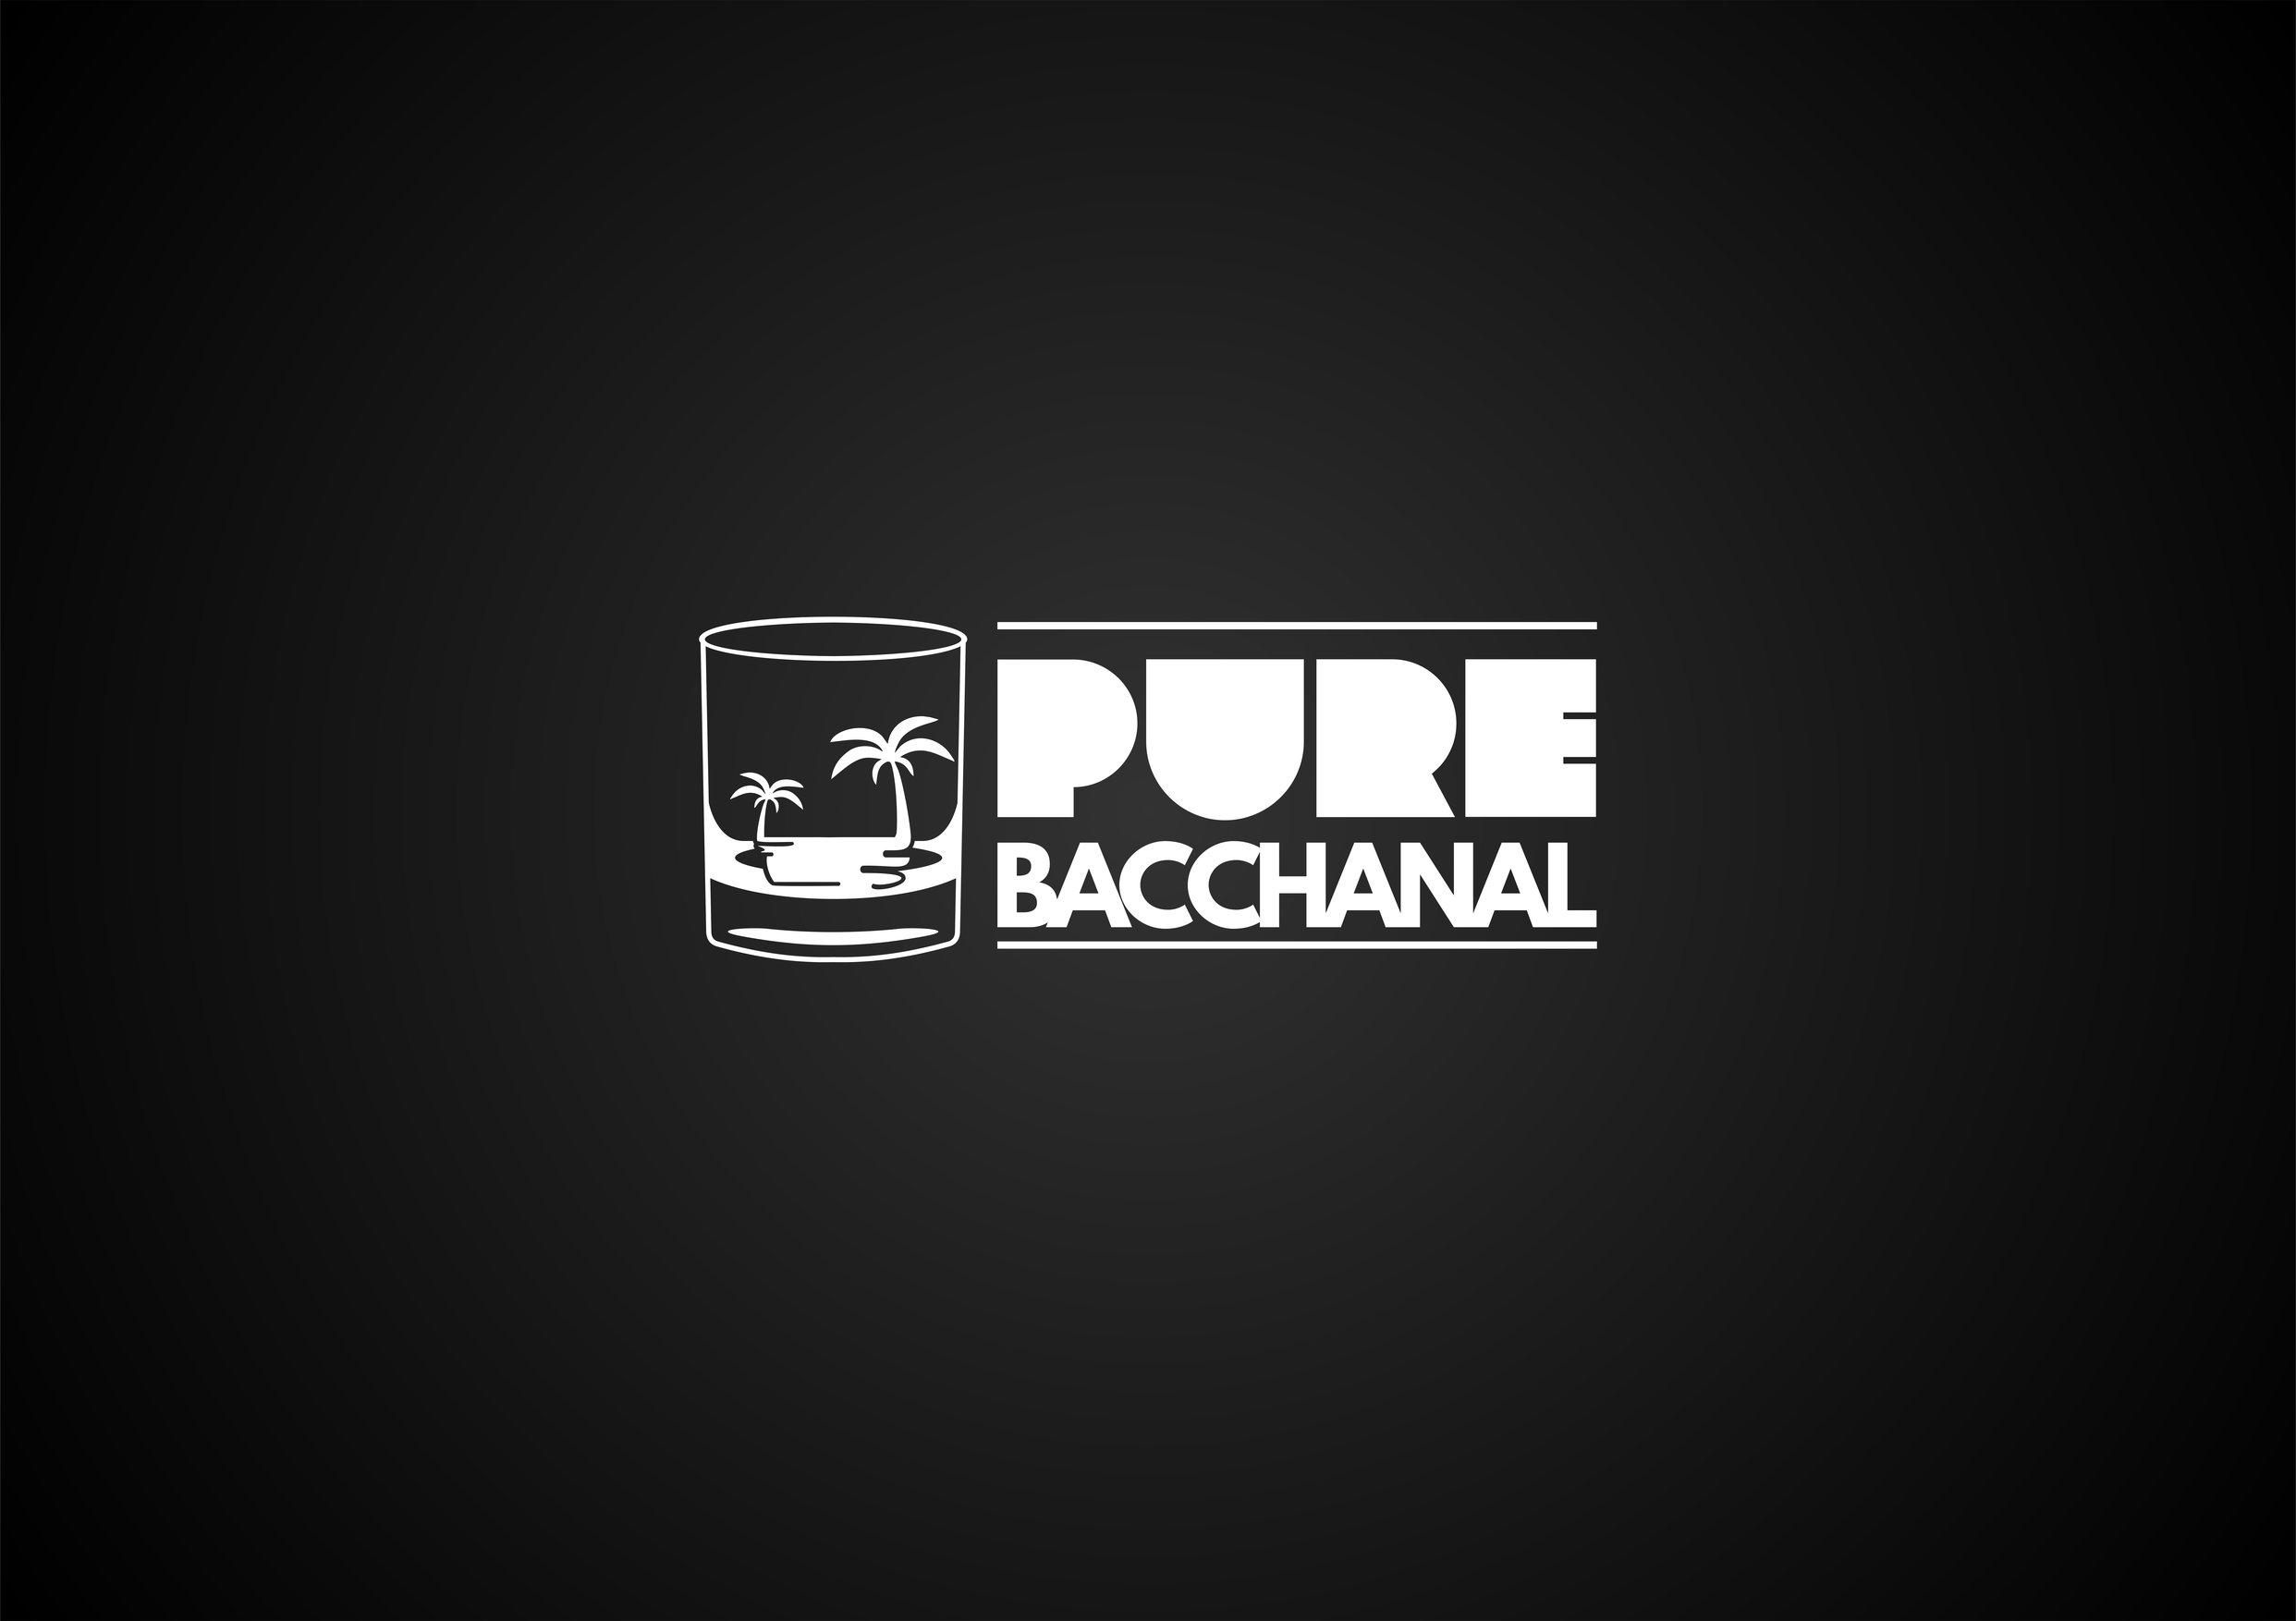 Pure Bacchanal